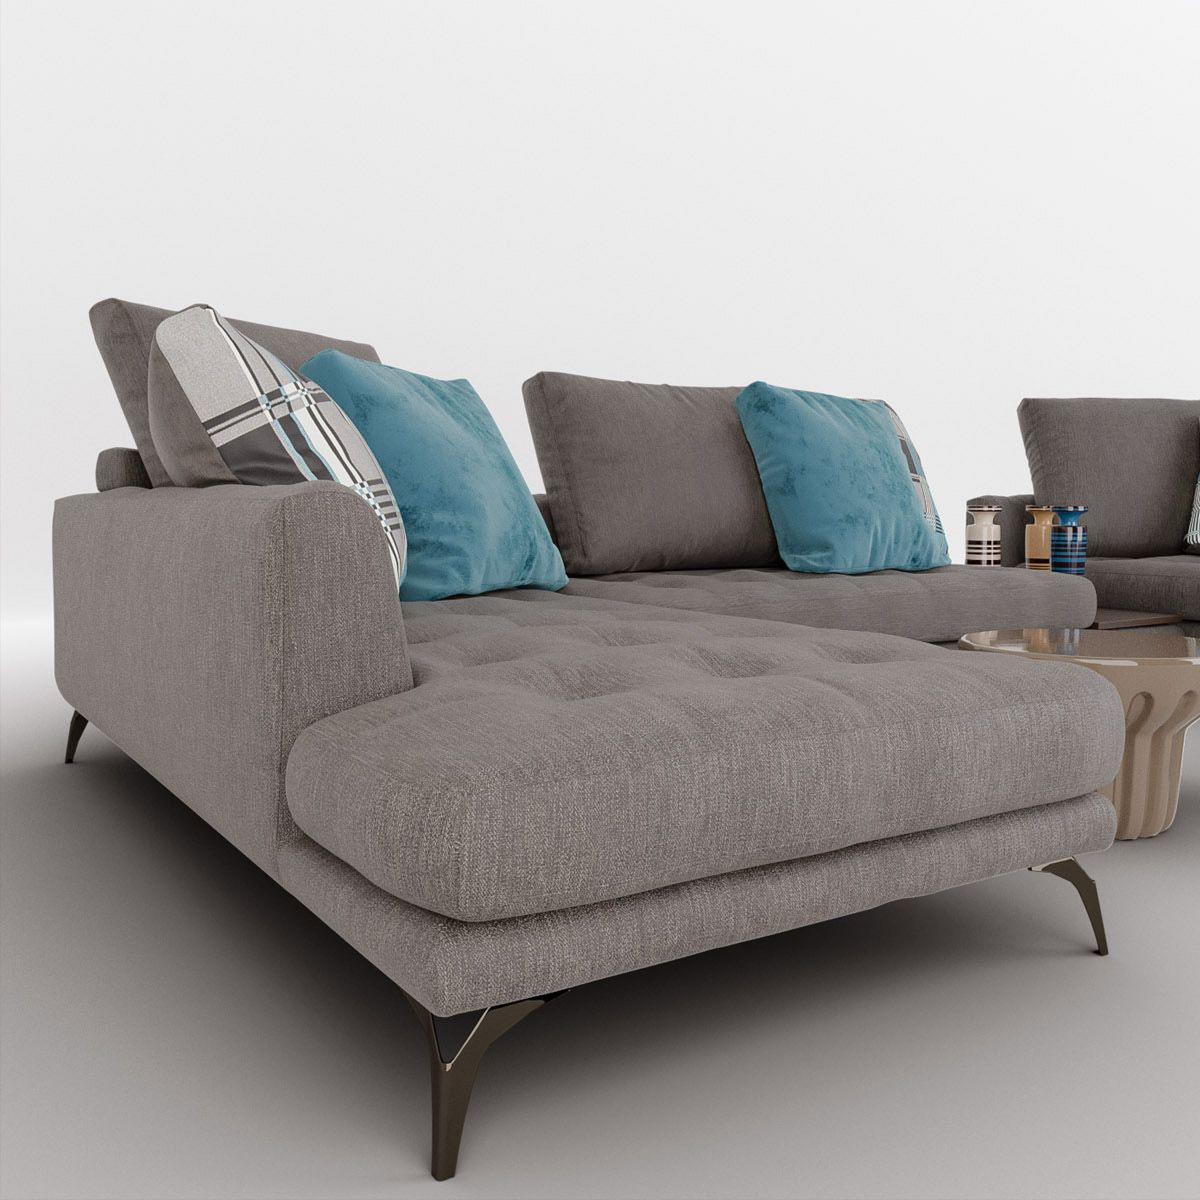 Sofa Symbole Composition Roche Bobois Sofa Buy Sofa Low Tables